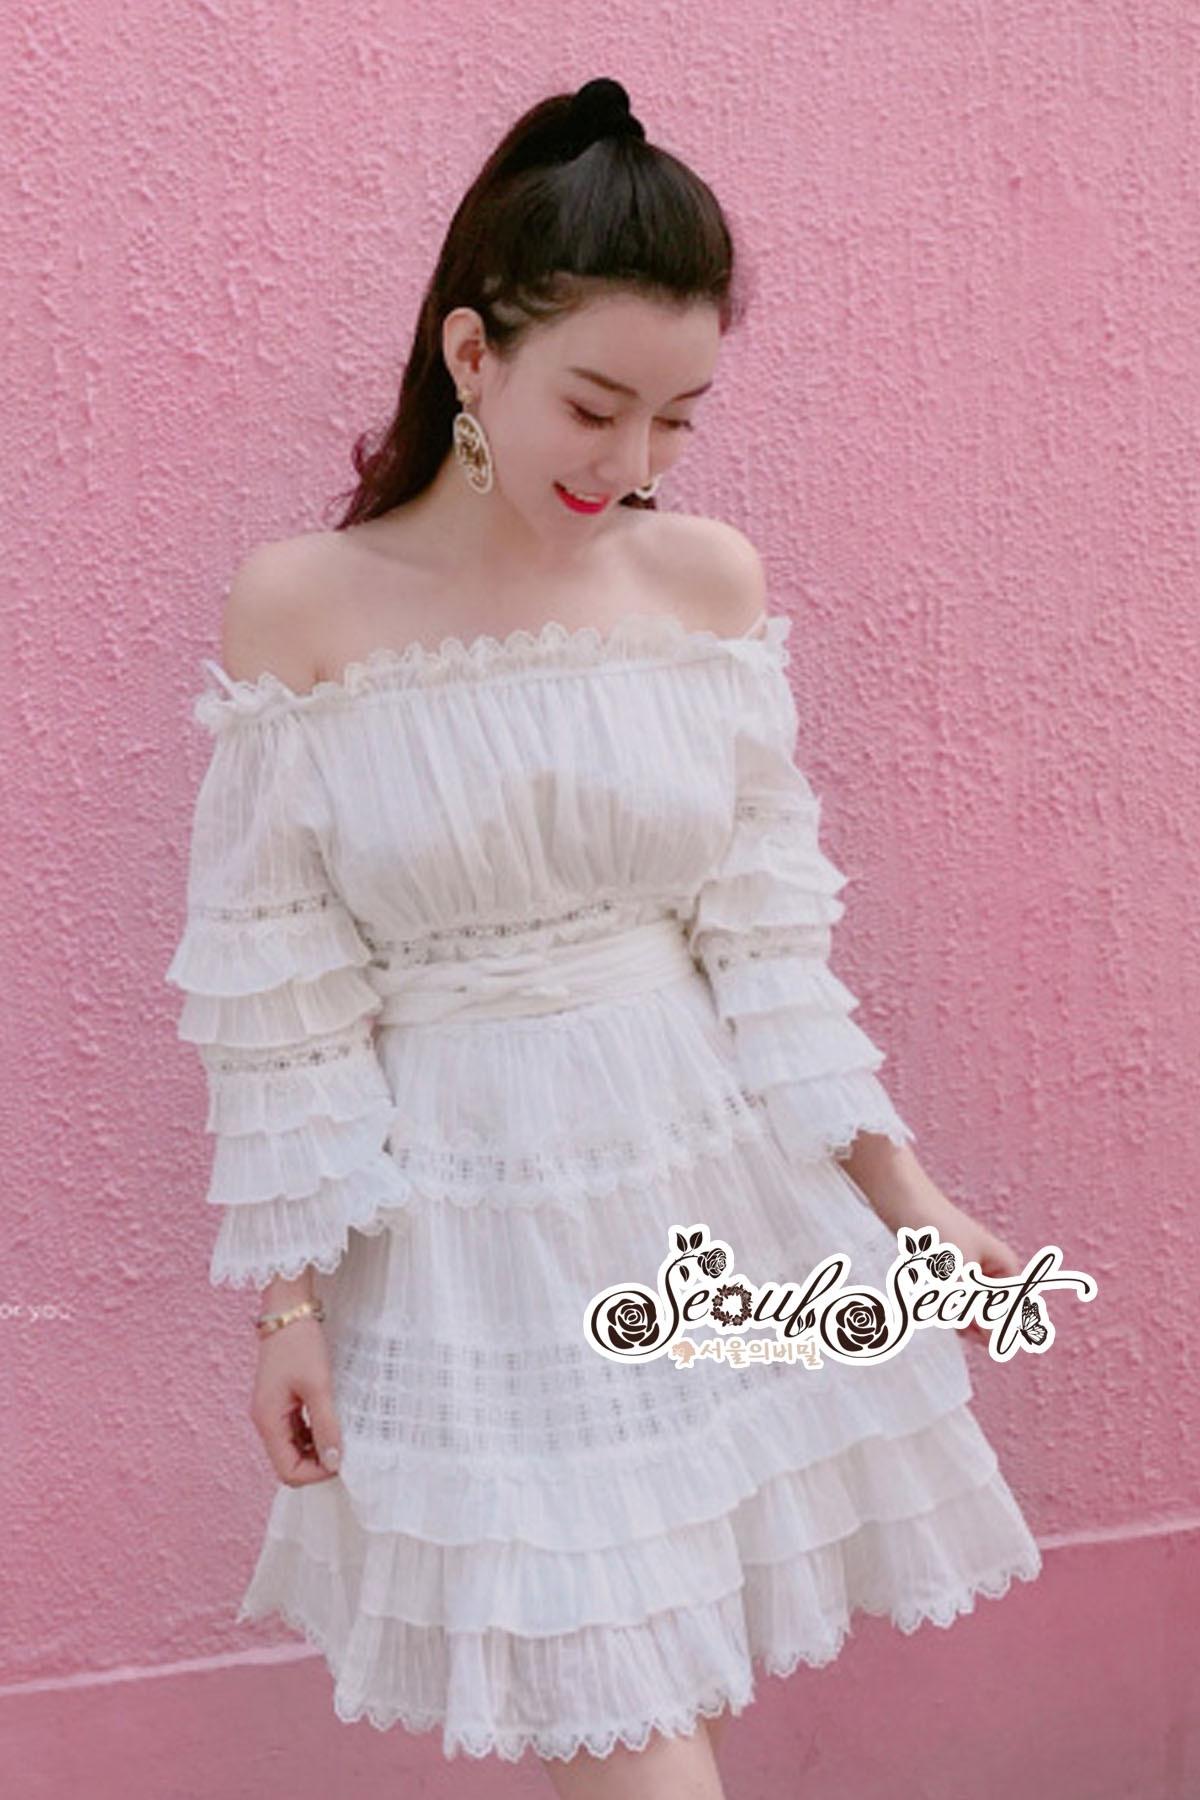 White Shoulder Dress Cutting Sewing Twist